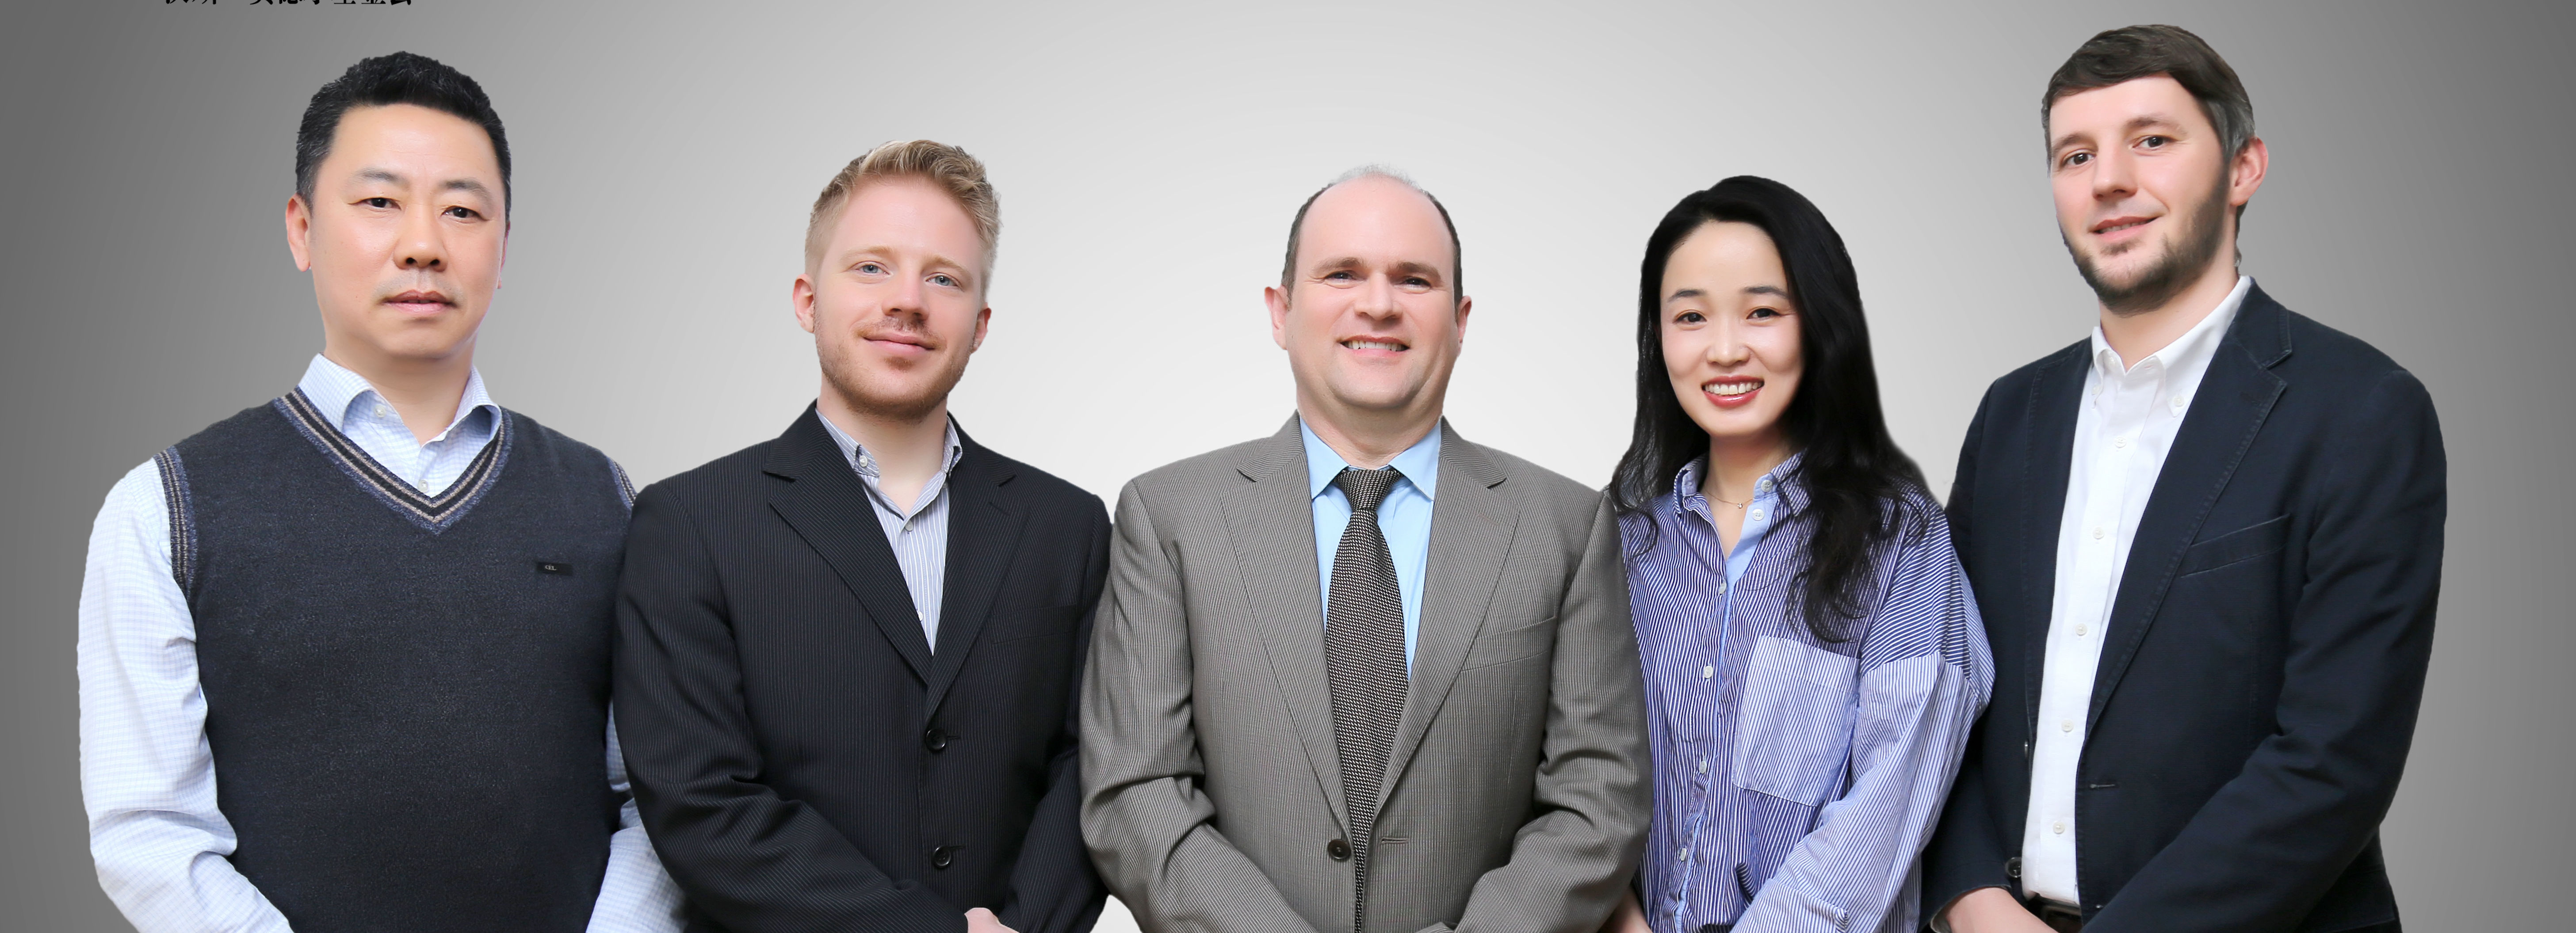 Hao Changgeng, Dominik Sprenger, Alexander Birle, Zhang Jingle, Jonas Rasch